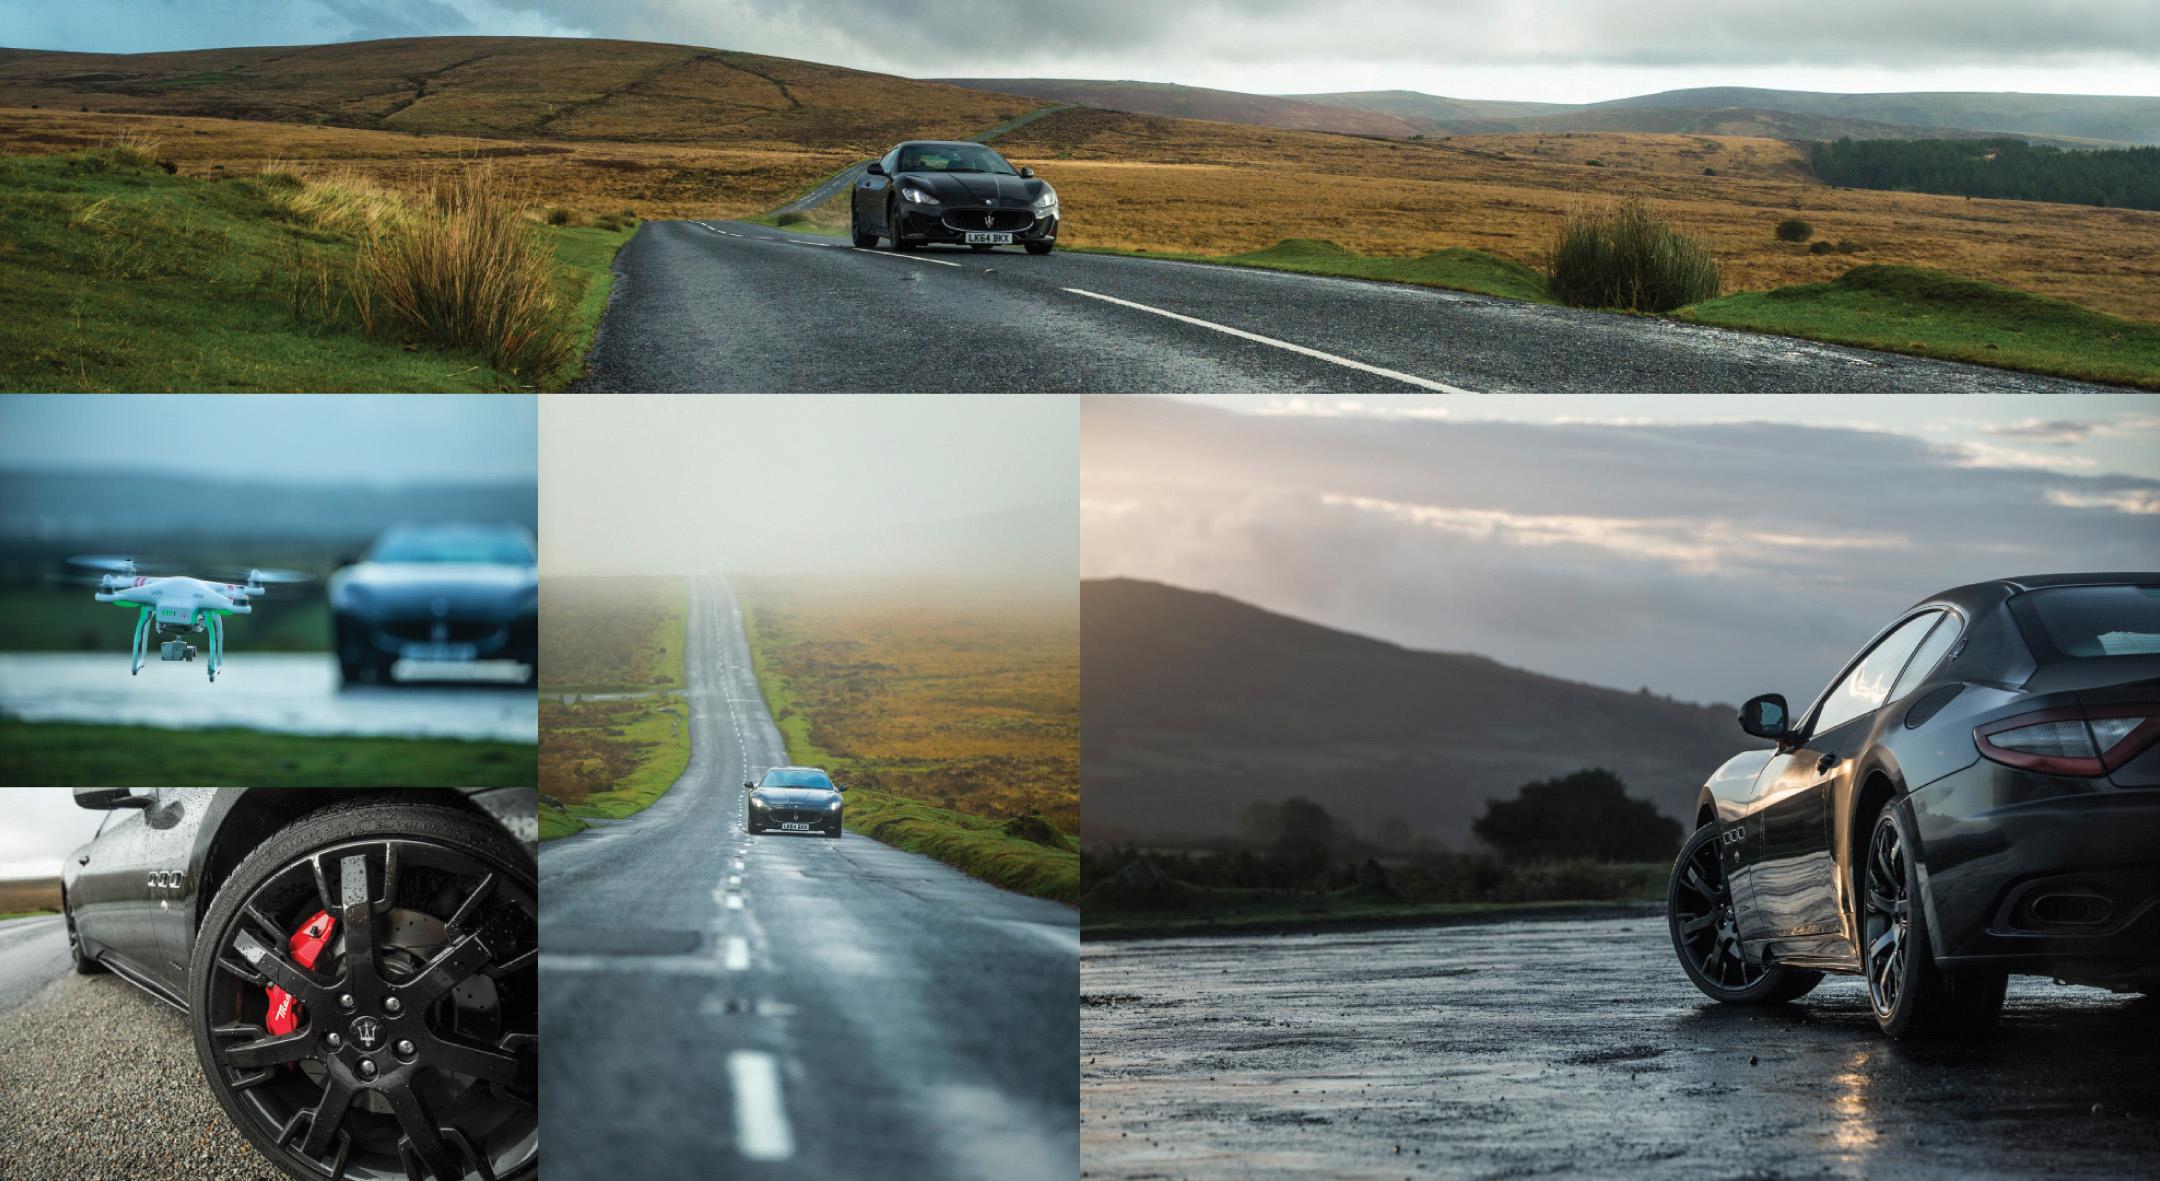 Maserati Video Production Car Photography Drone Mhg Design